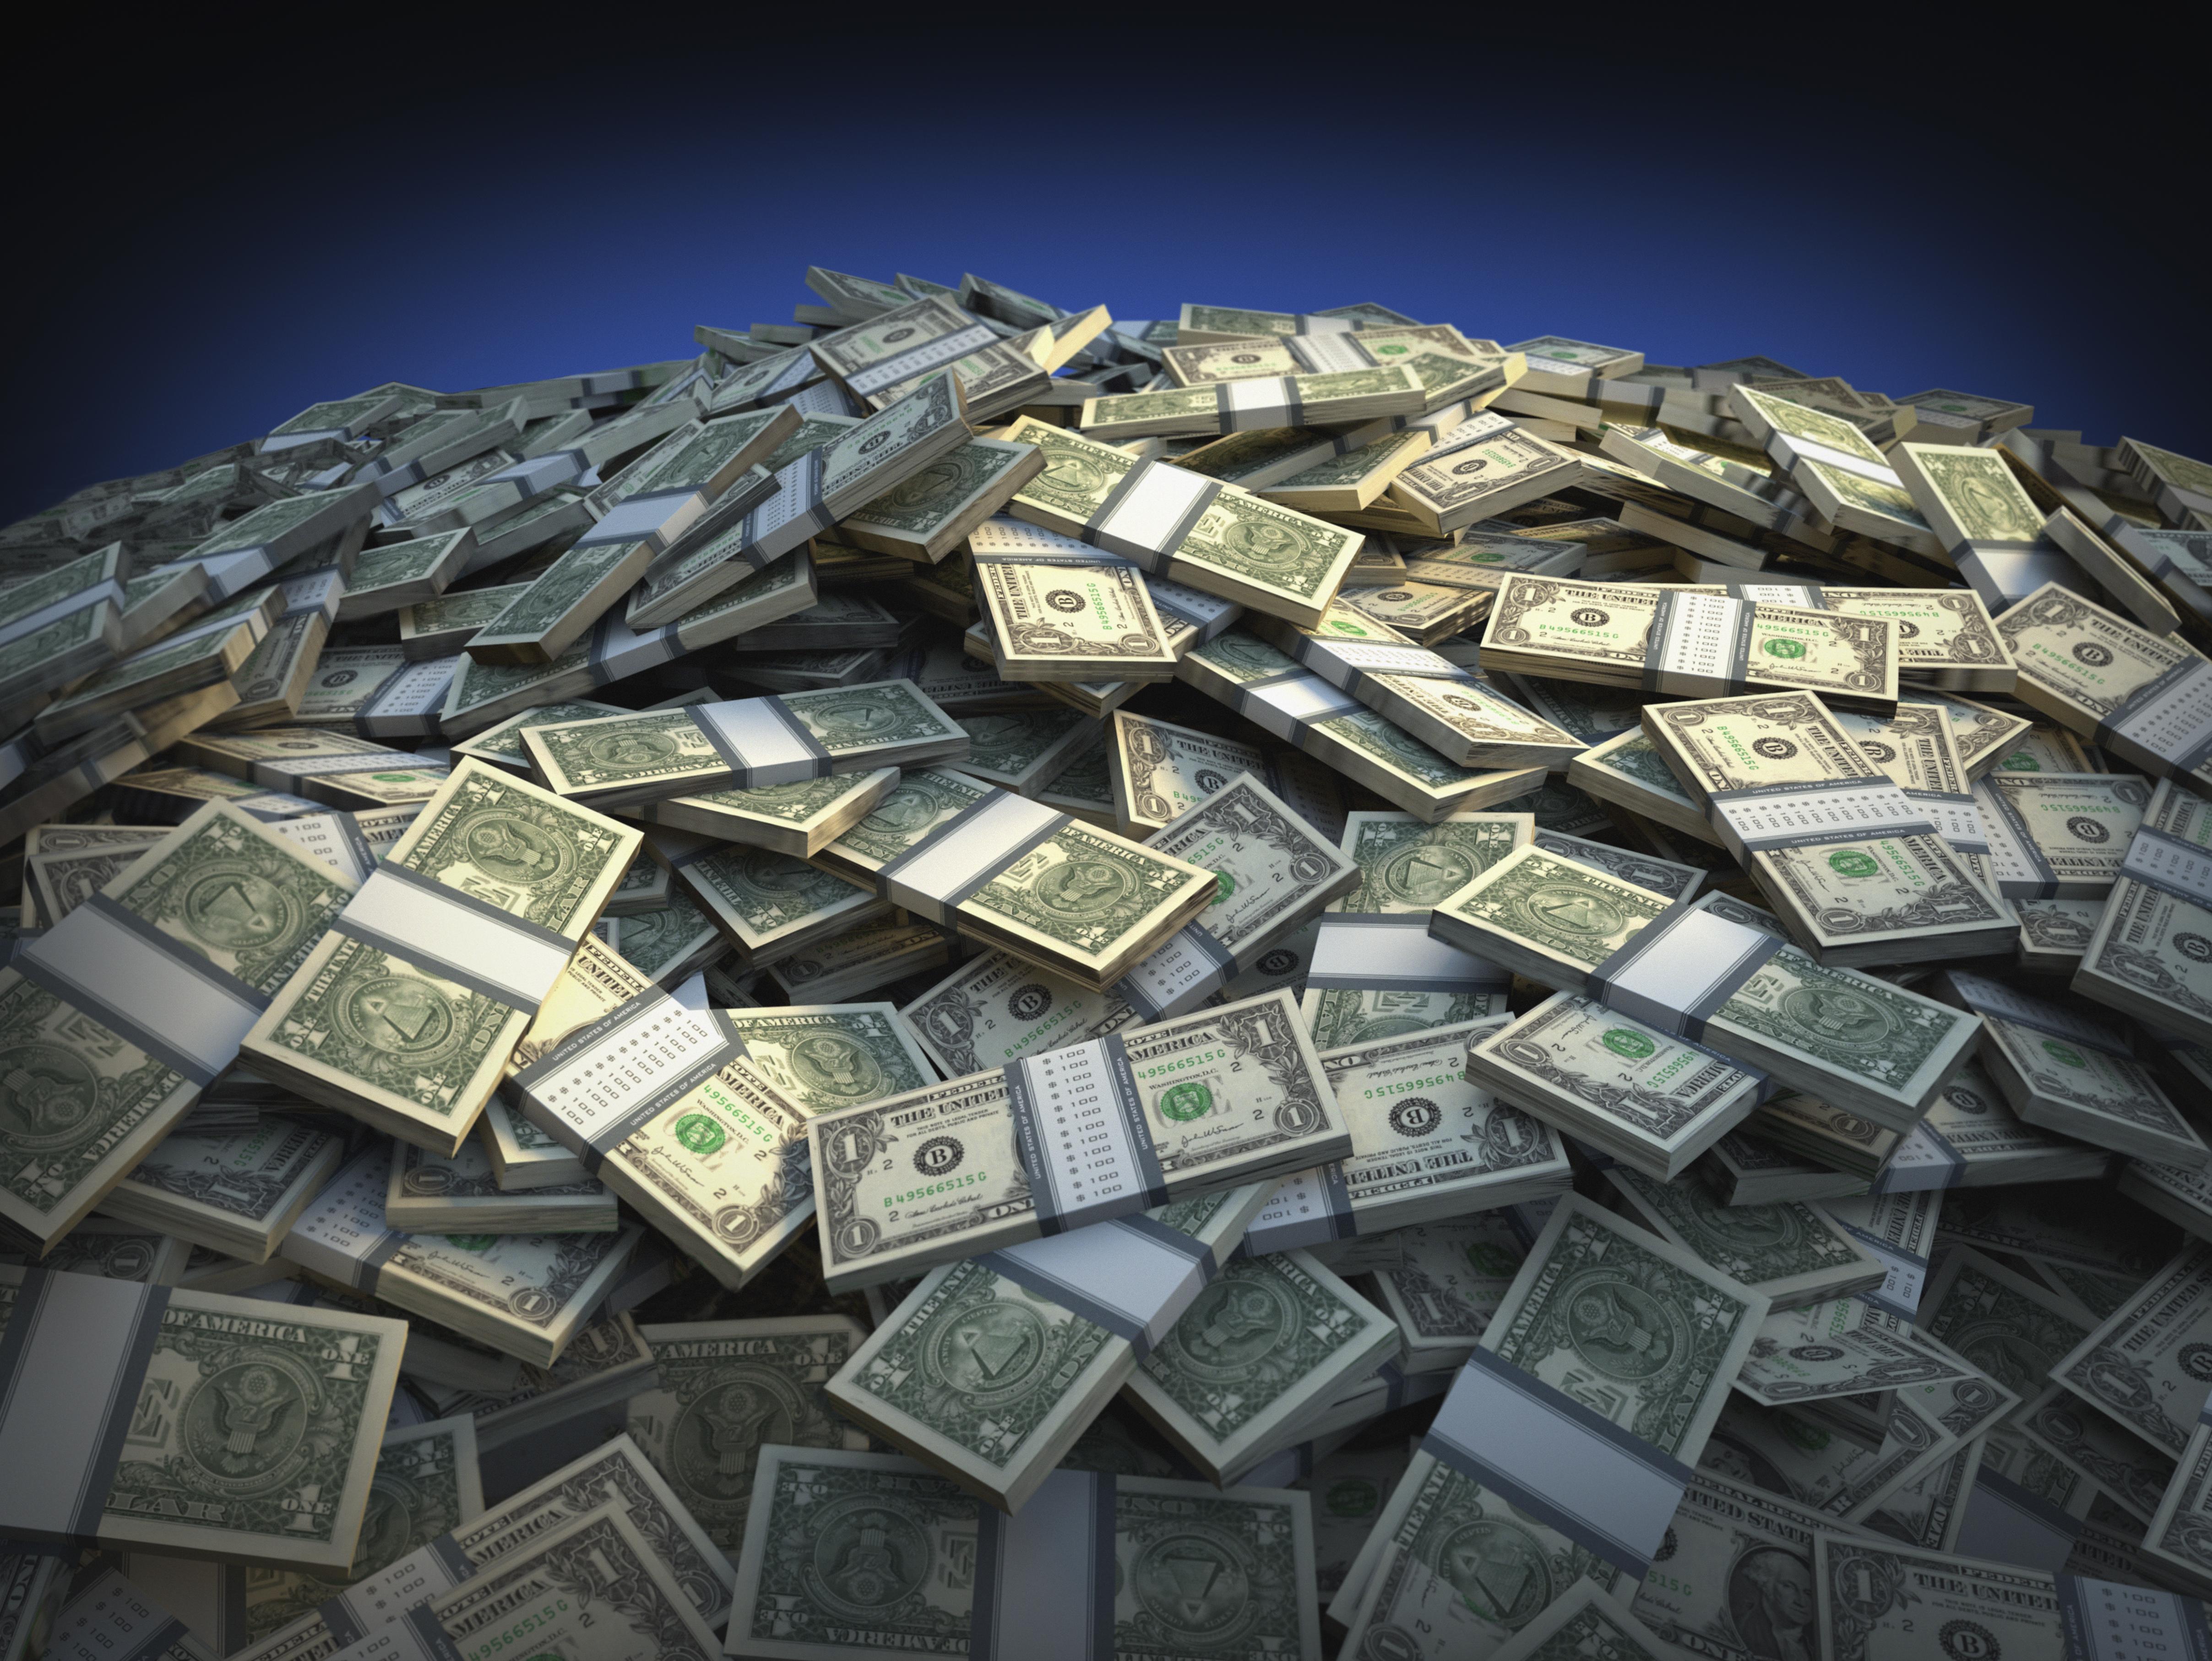 Bundles of one dollar bills